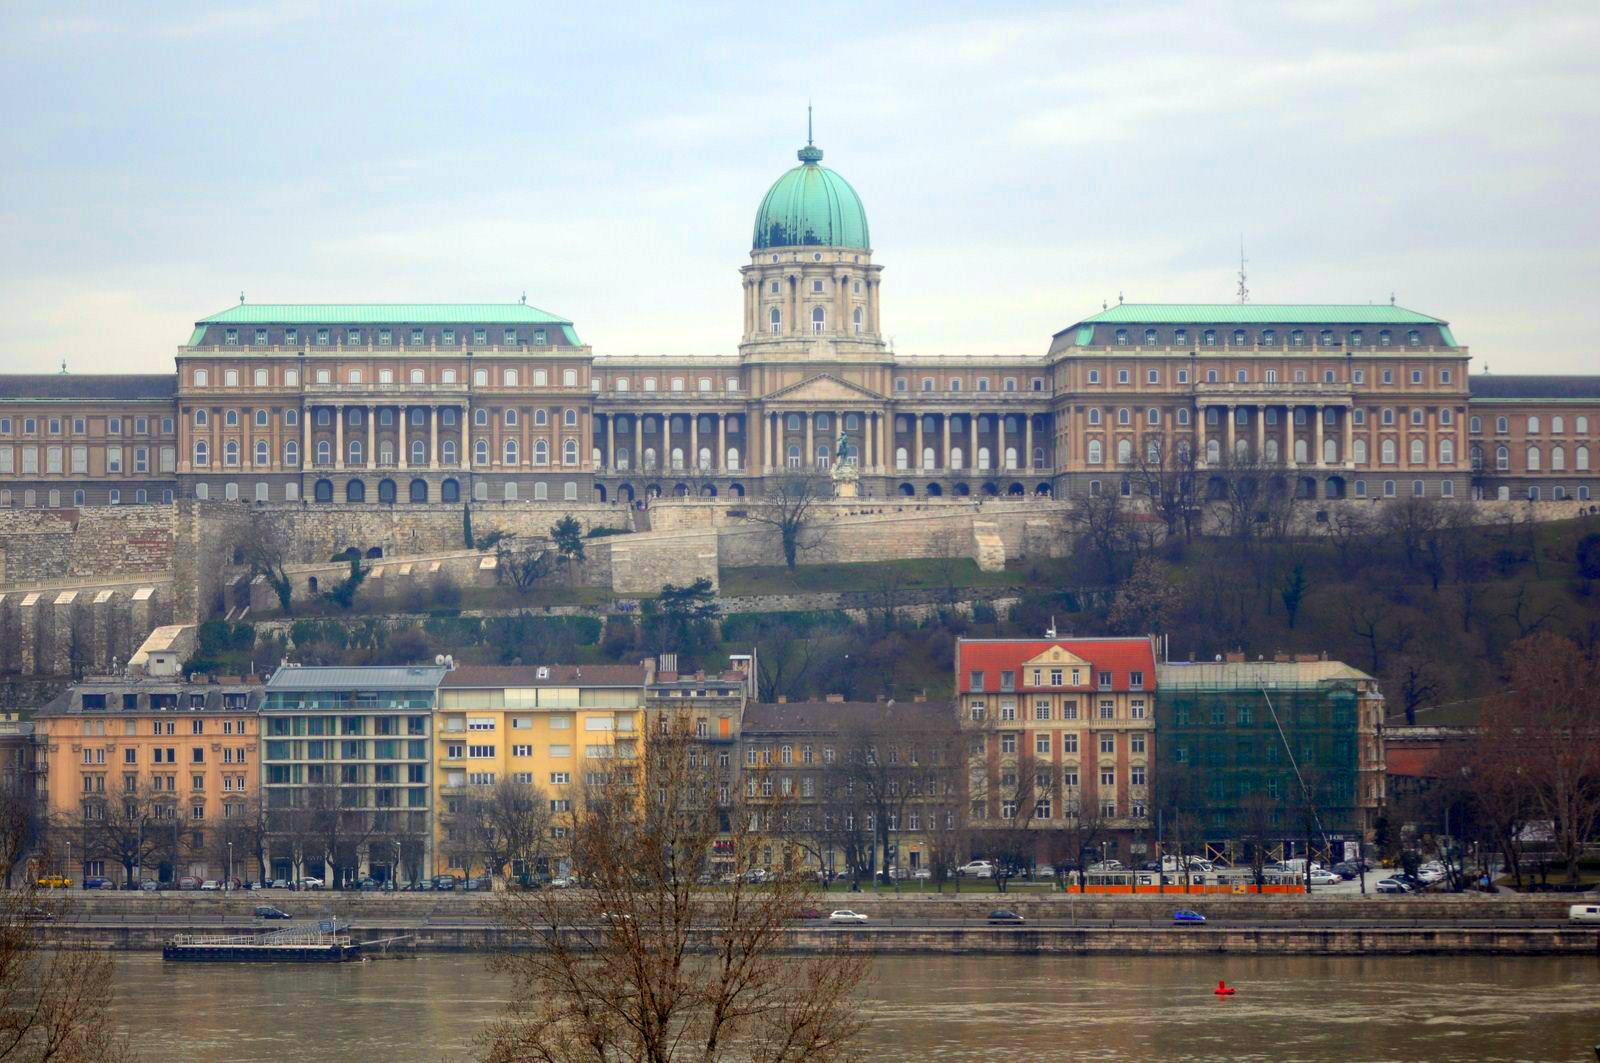 Qué ver en Budapest en un fin de semana budapest en un fin de semana - 21396093706 02f1b0a130 o - Qué ver en Budapest en un fin de semana